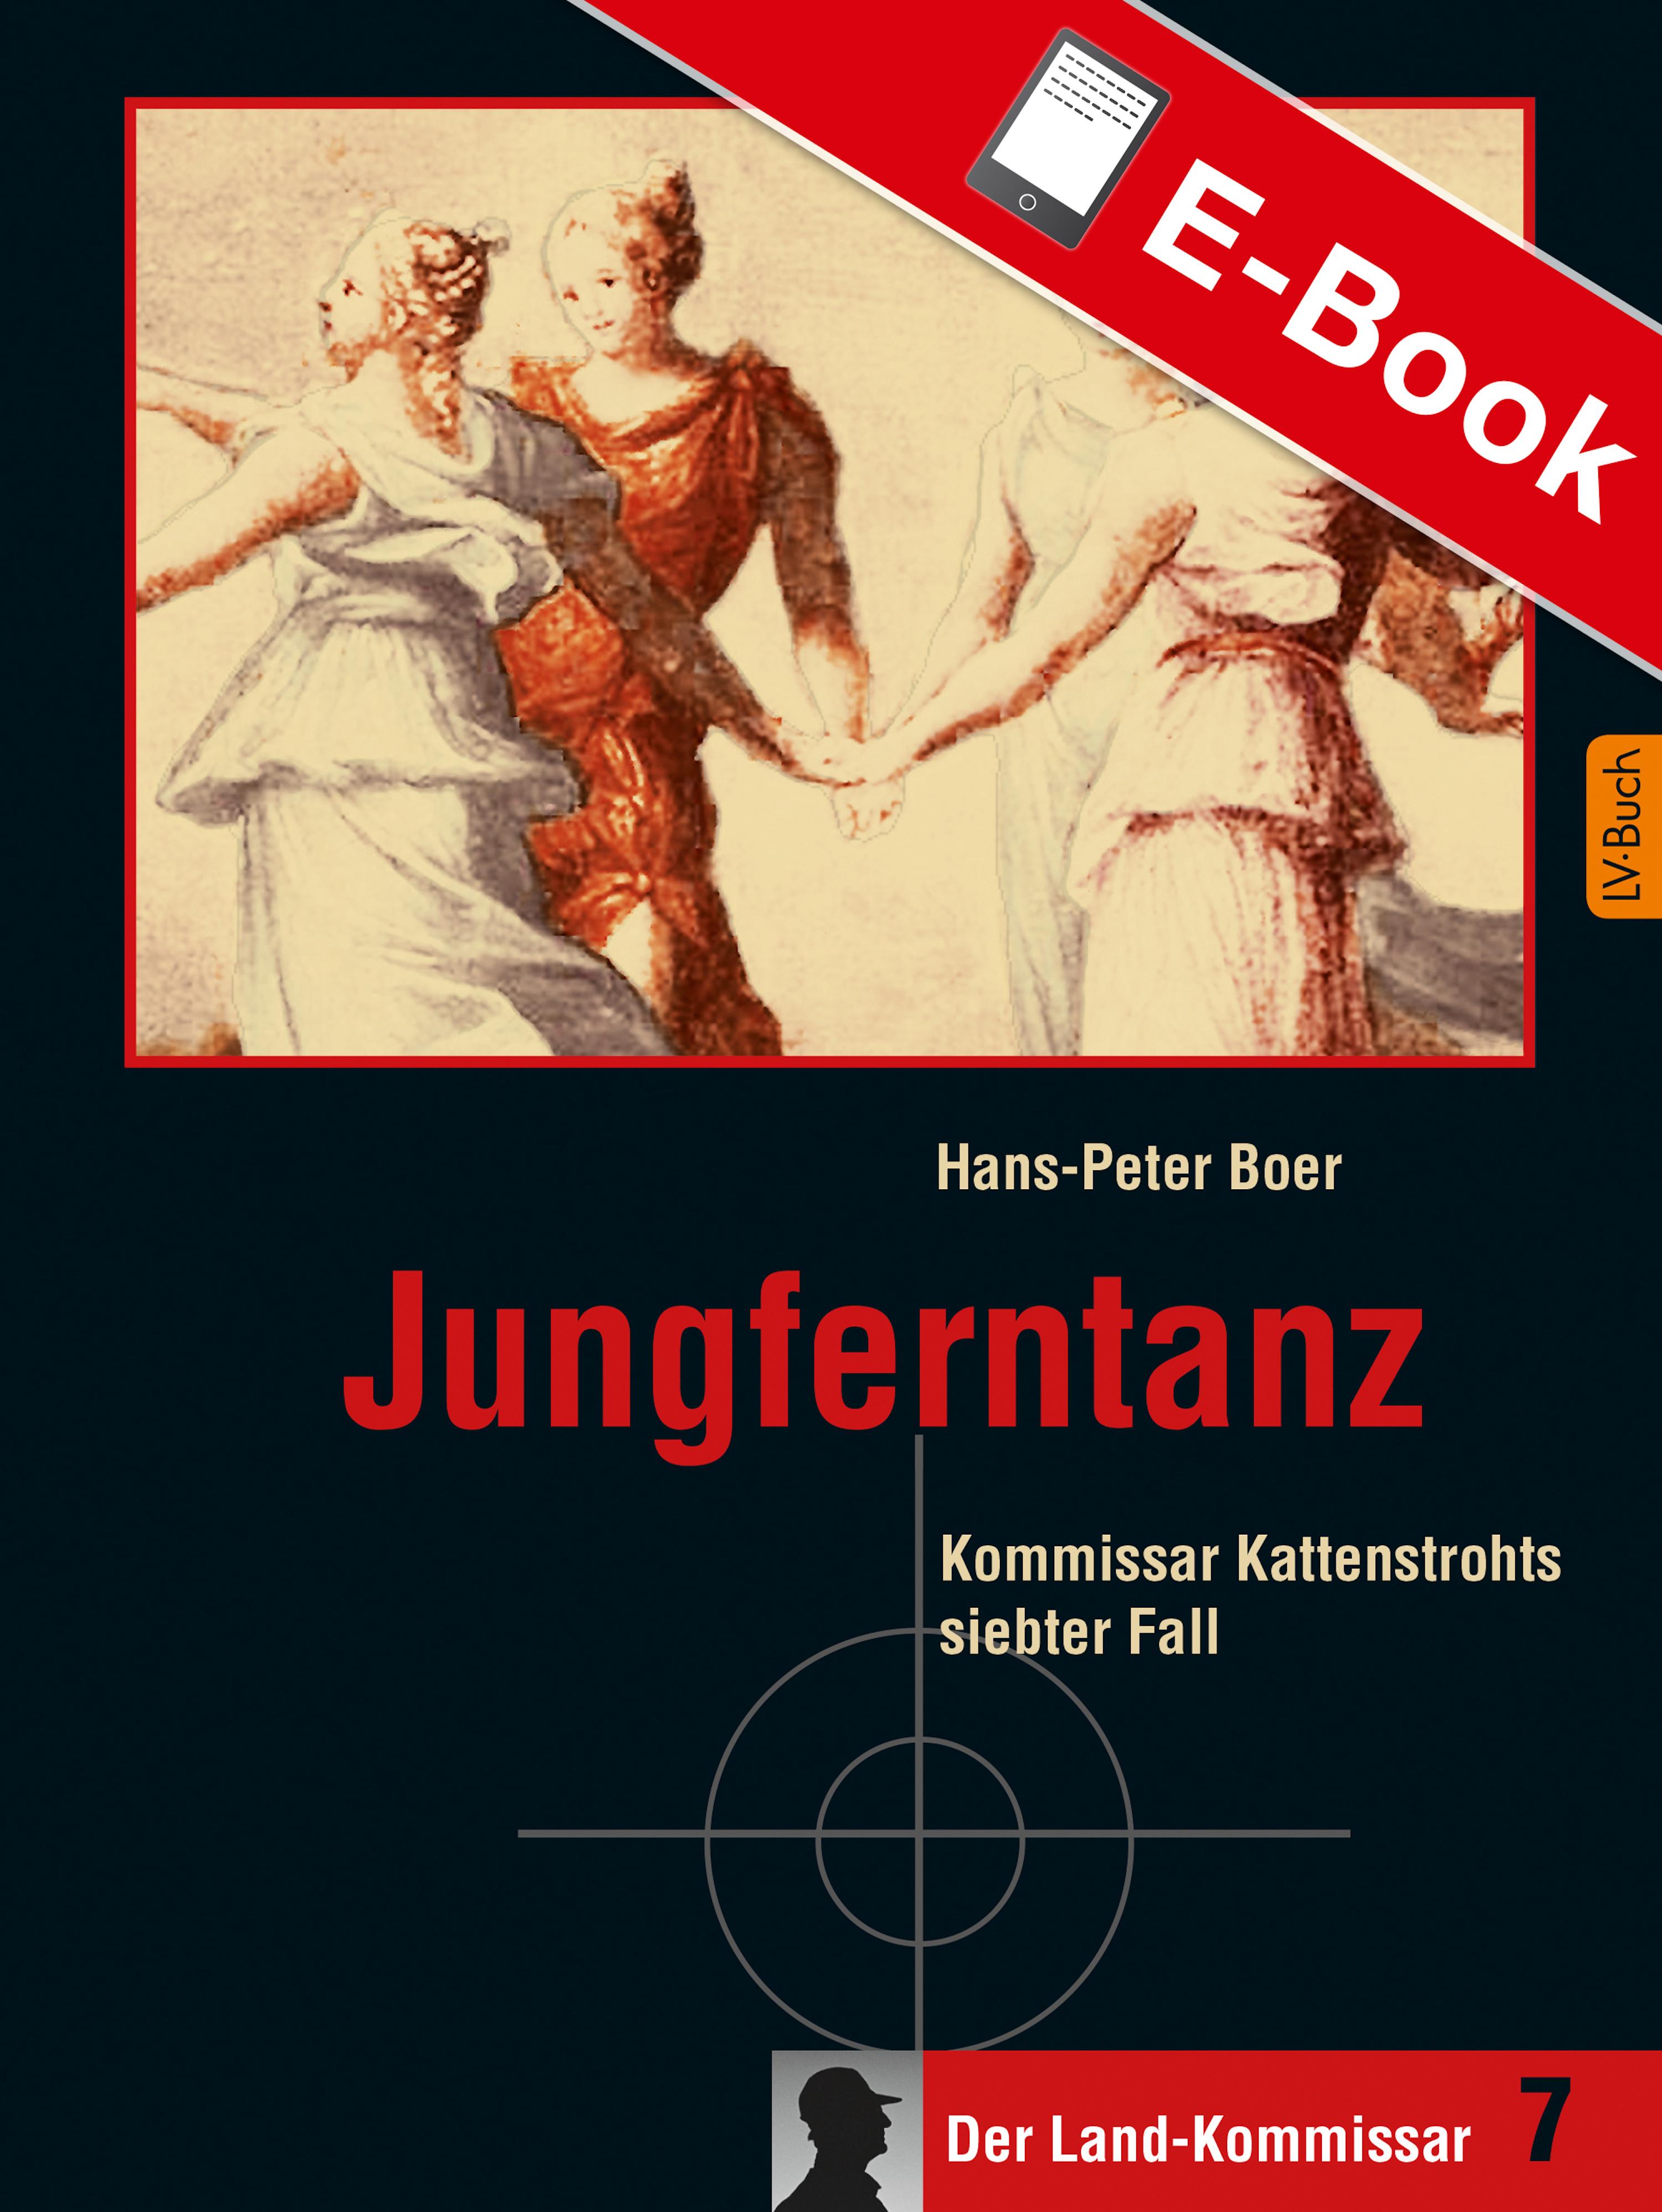 Hans-Peter Boer Jungferntanz hans peter holst den lille hornblaeser et digt danish edition